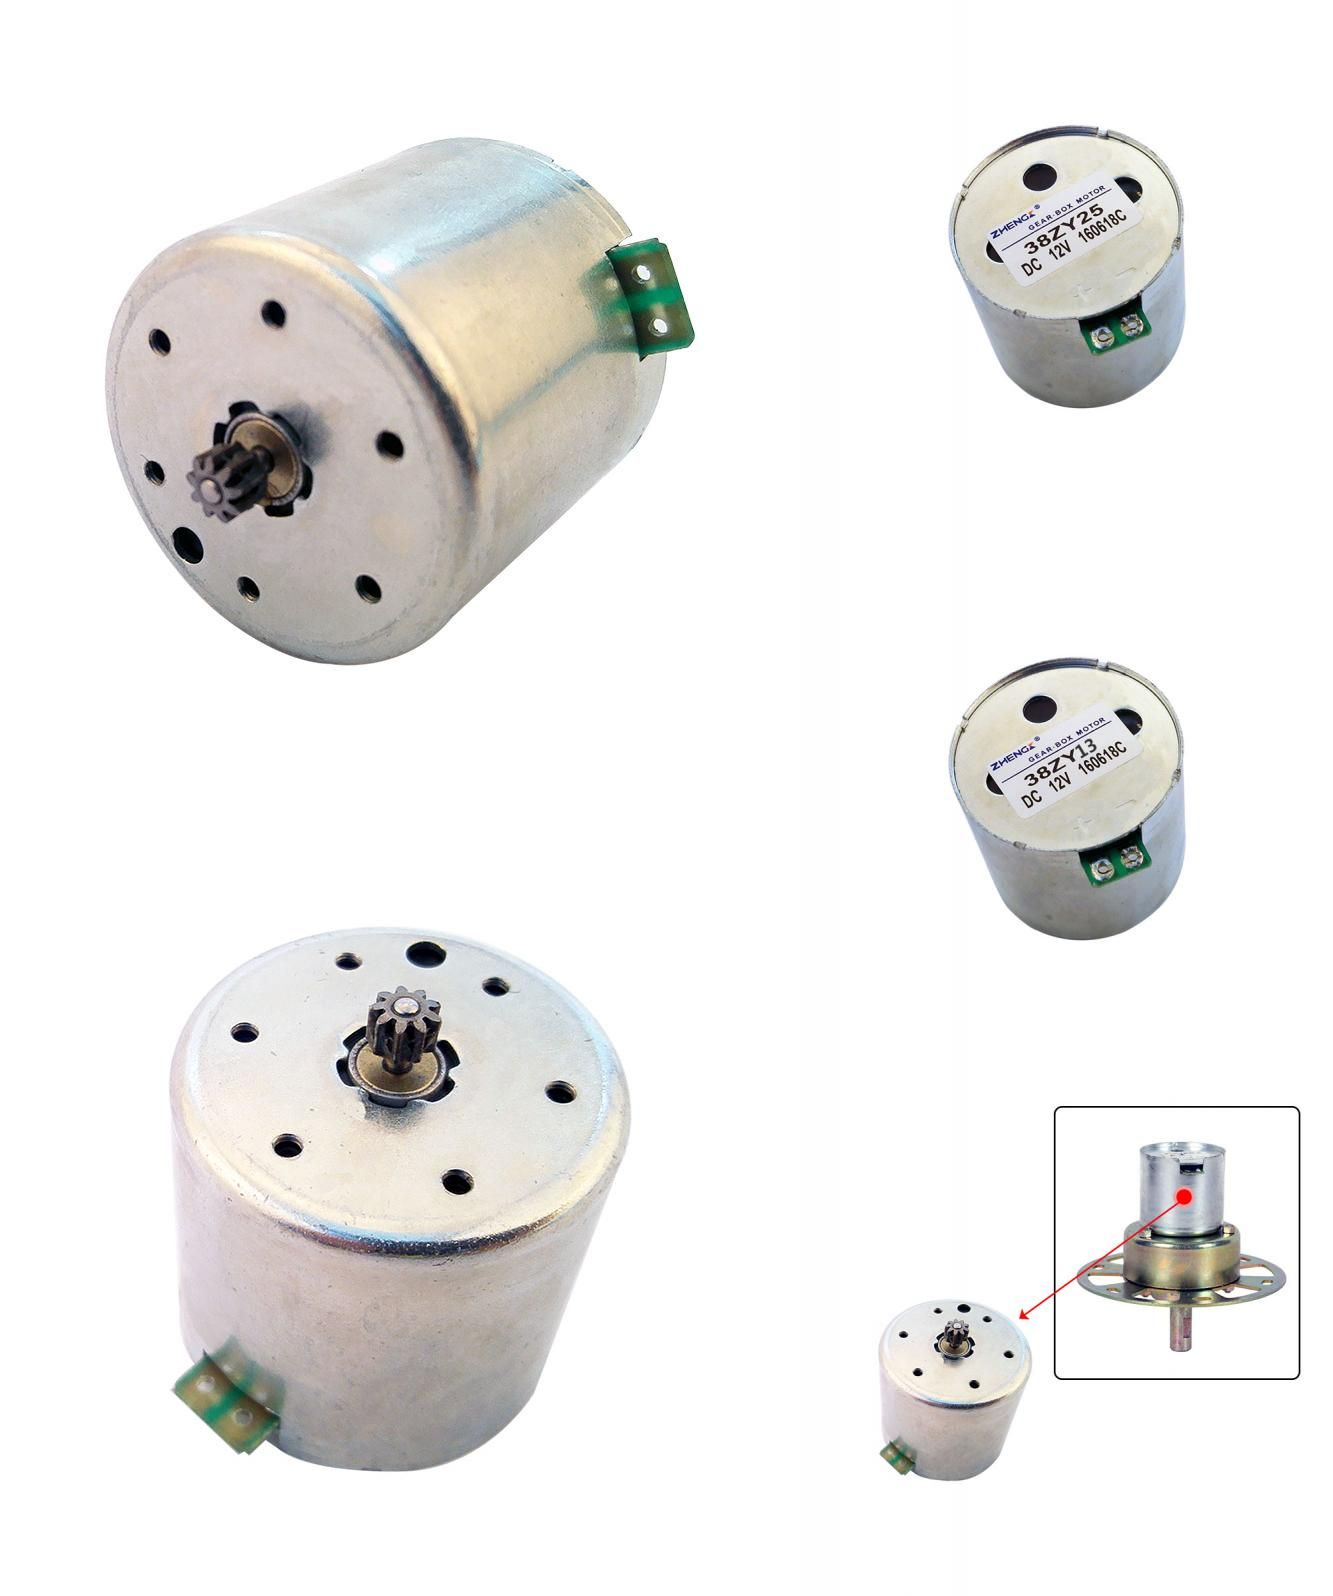 Visit To Buy Voltage Regulator 12v Dc Motor 38zy25 38zy13 For Replacement Parts Advertisement Voltage Regulator Metal Gear Popsockets